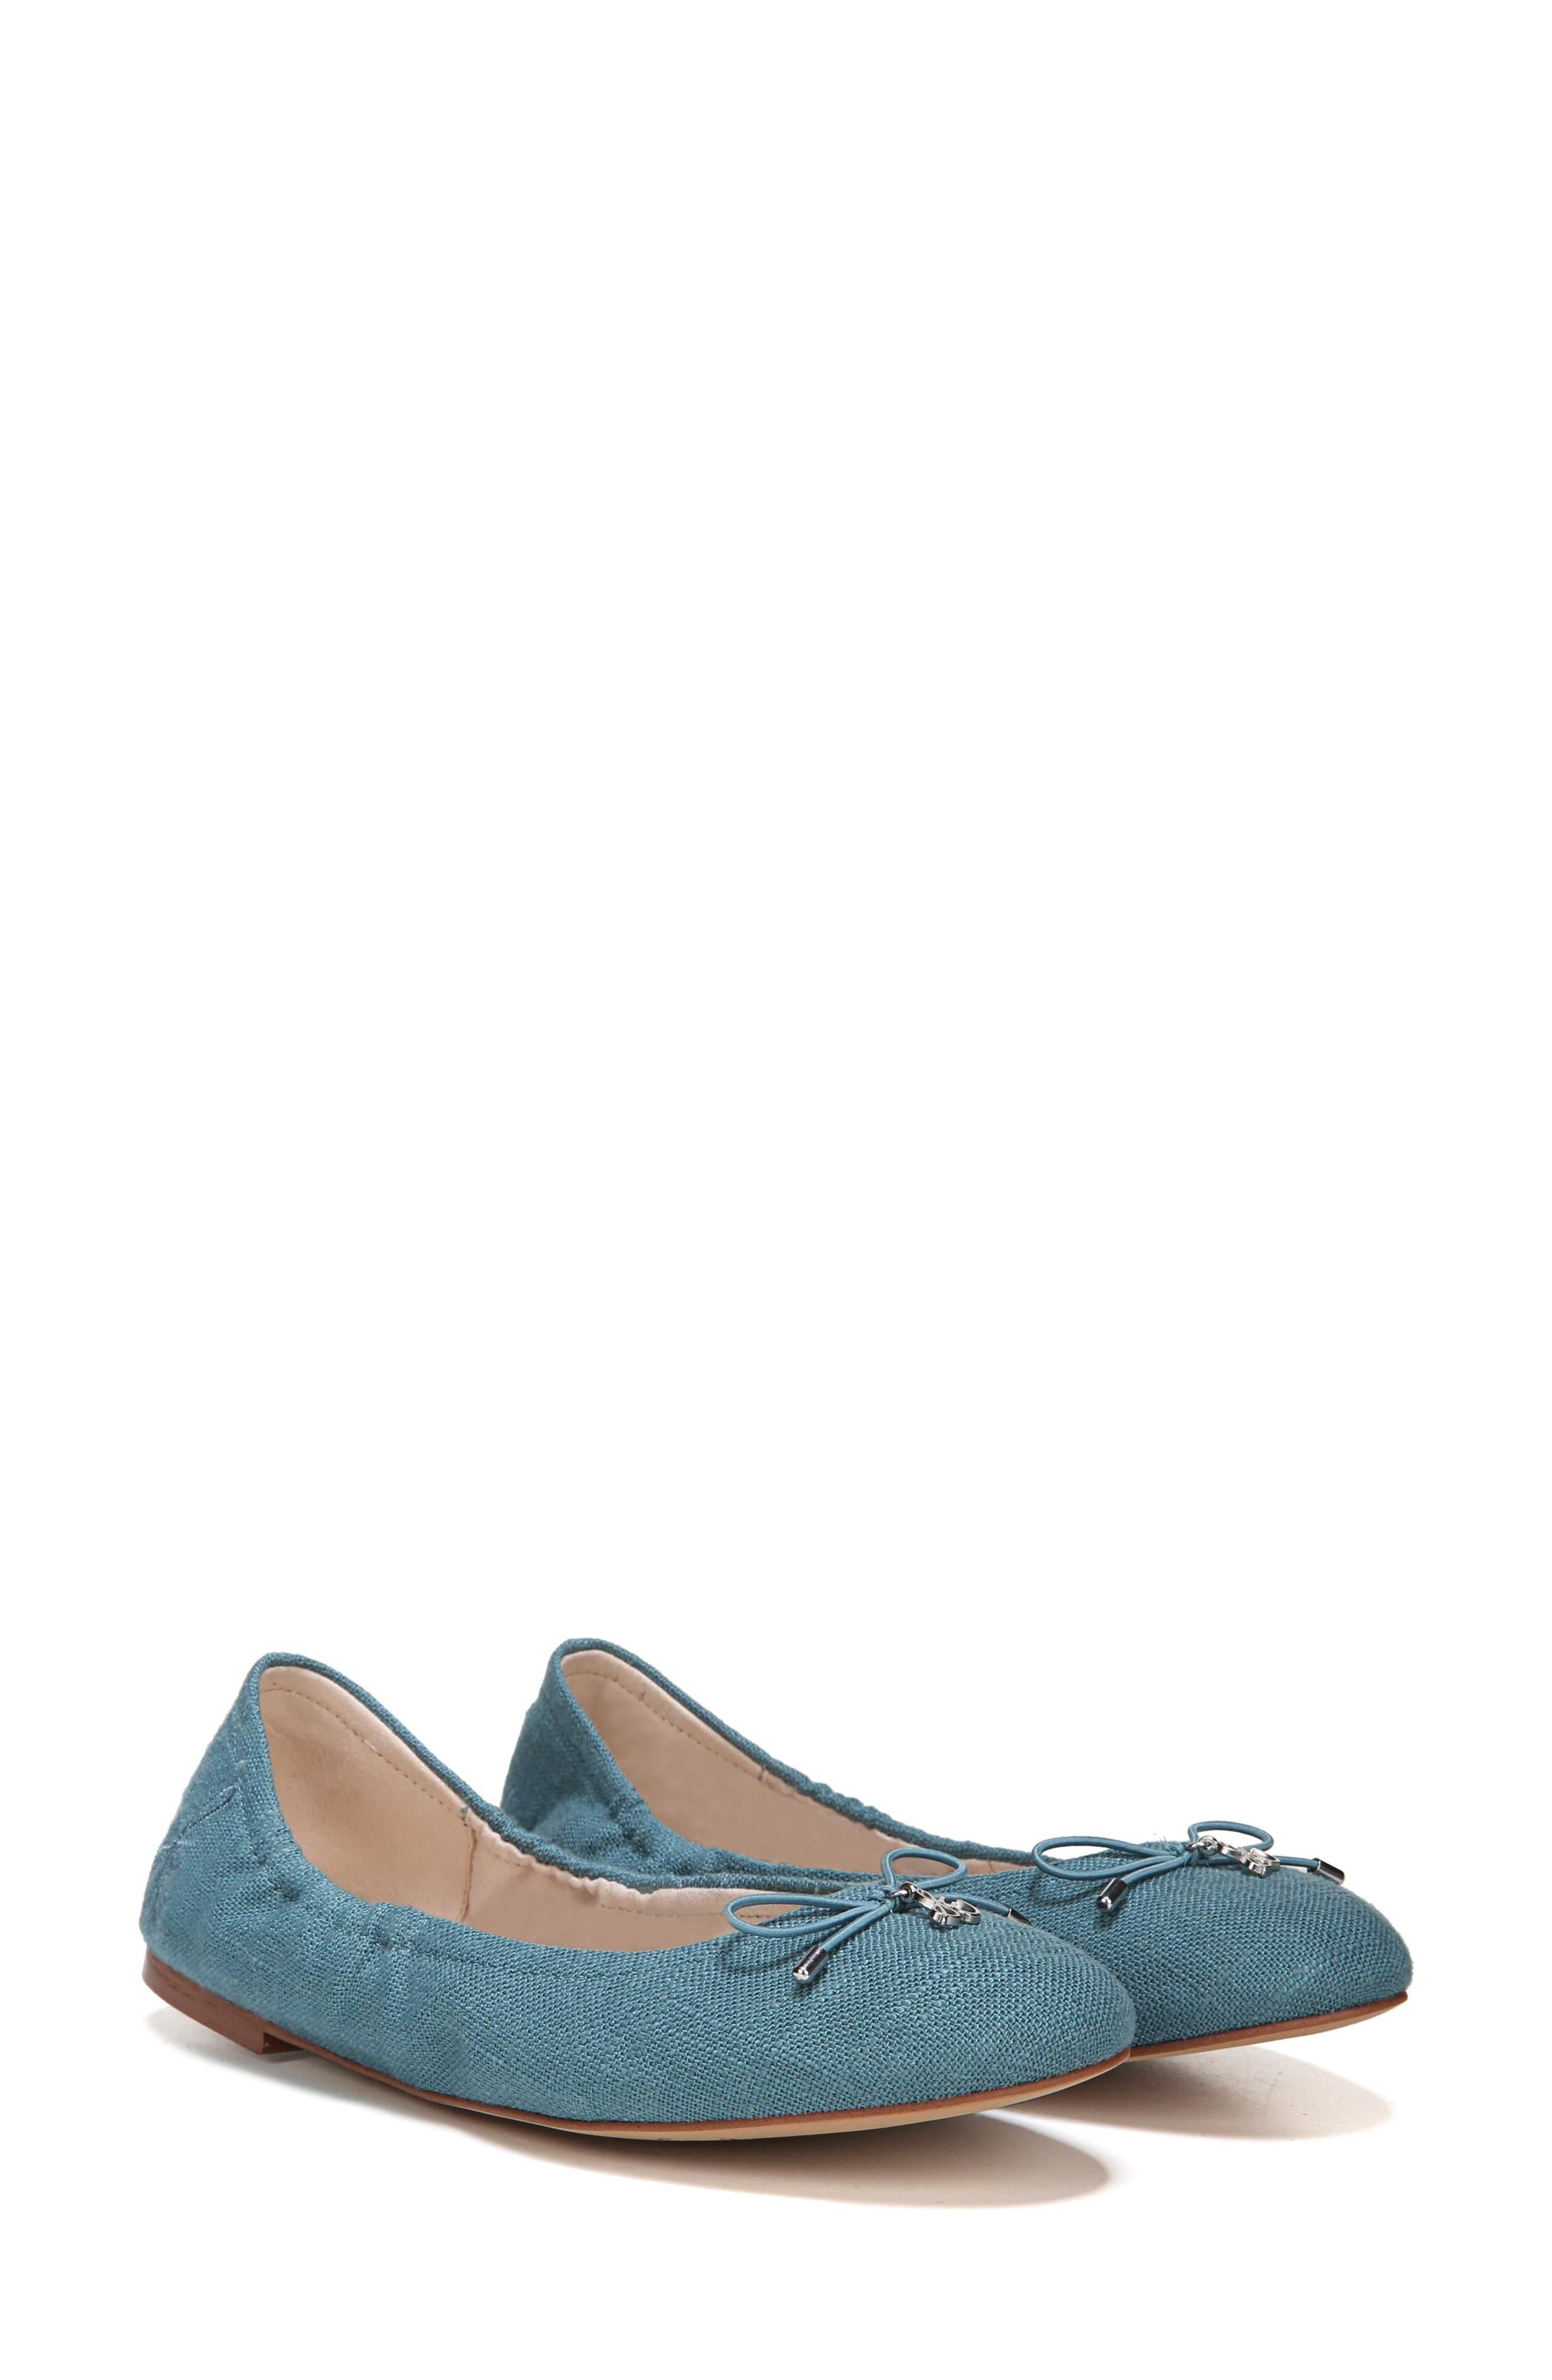 Felicia Flat,                             Alternate thumbnail 6, color,                             DENIM BLUE FABRIC